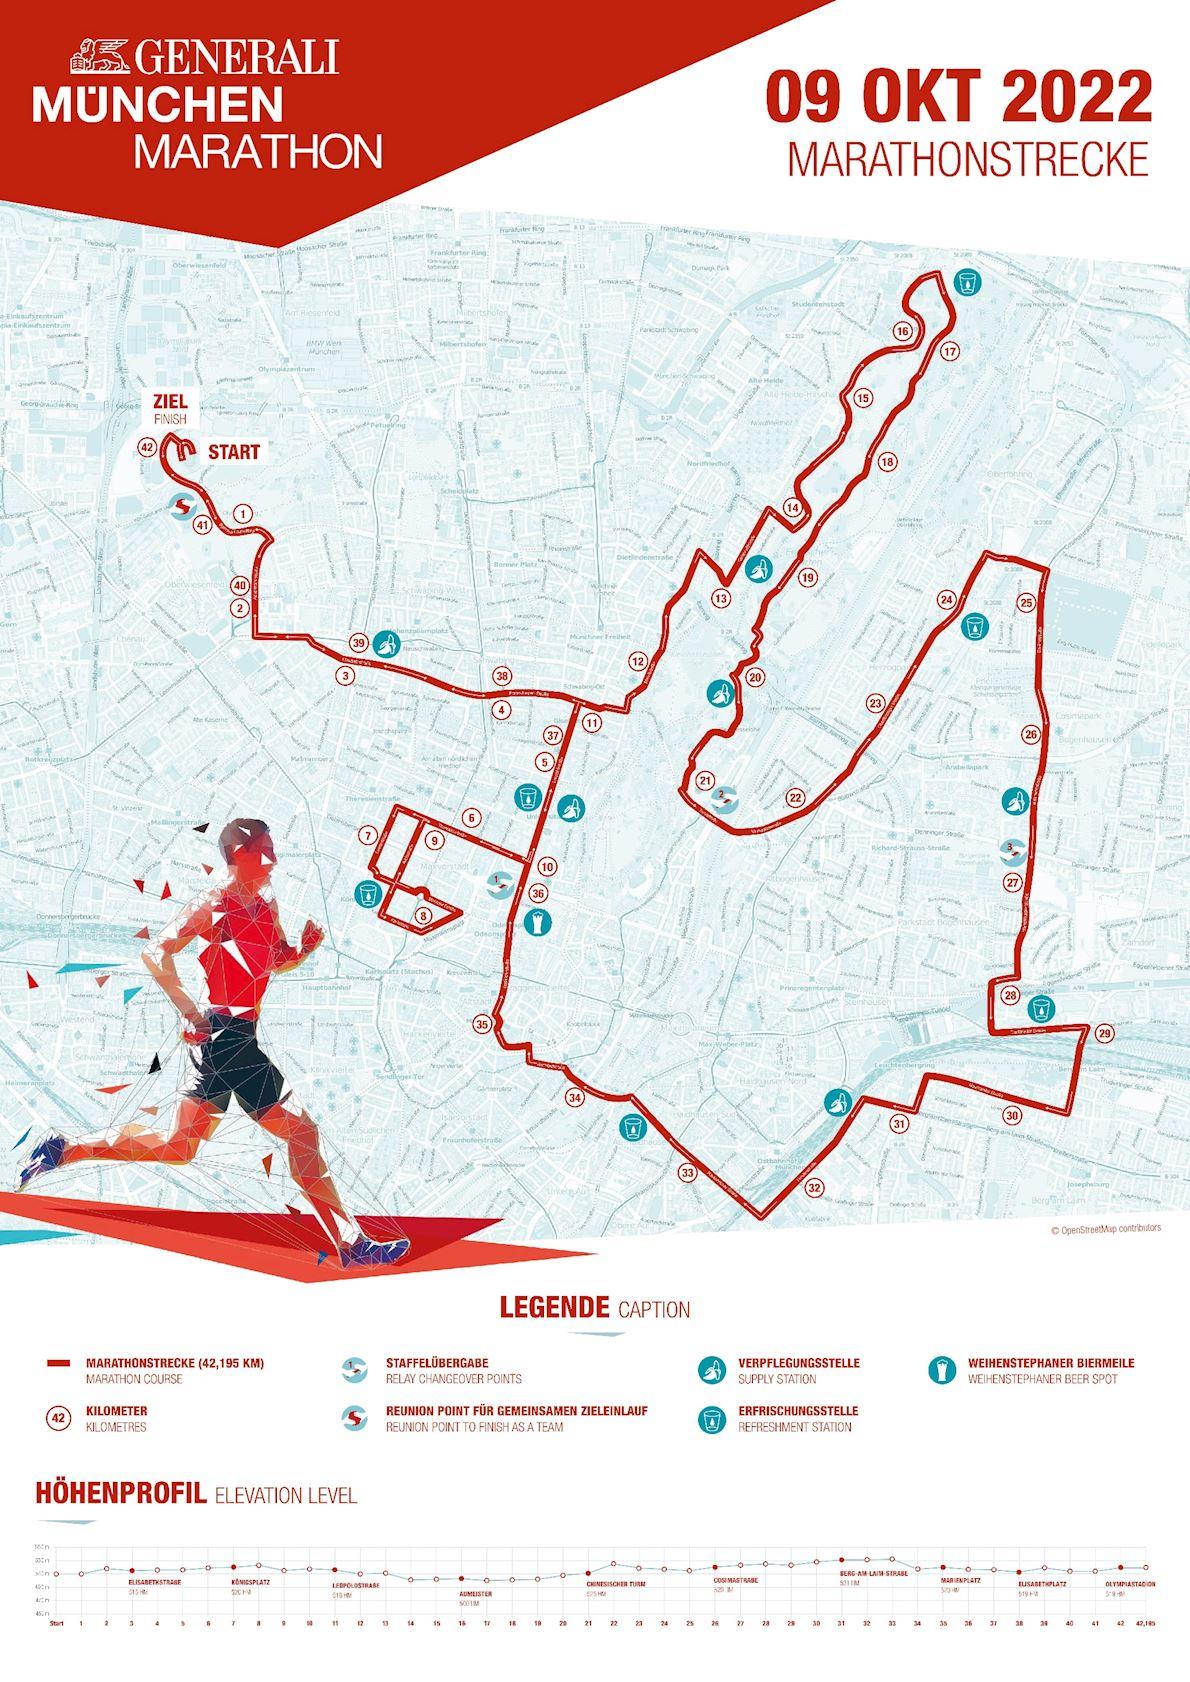 Generali Munich Marathon MAPA DEL RECORRIDO DE